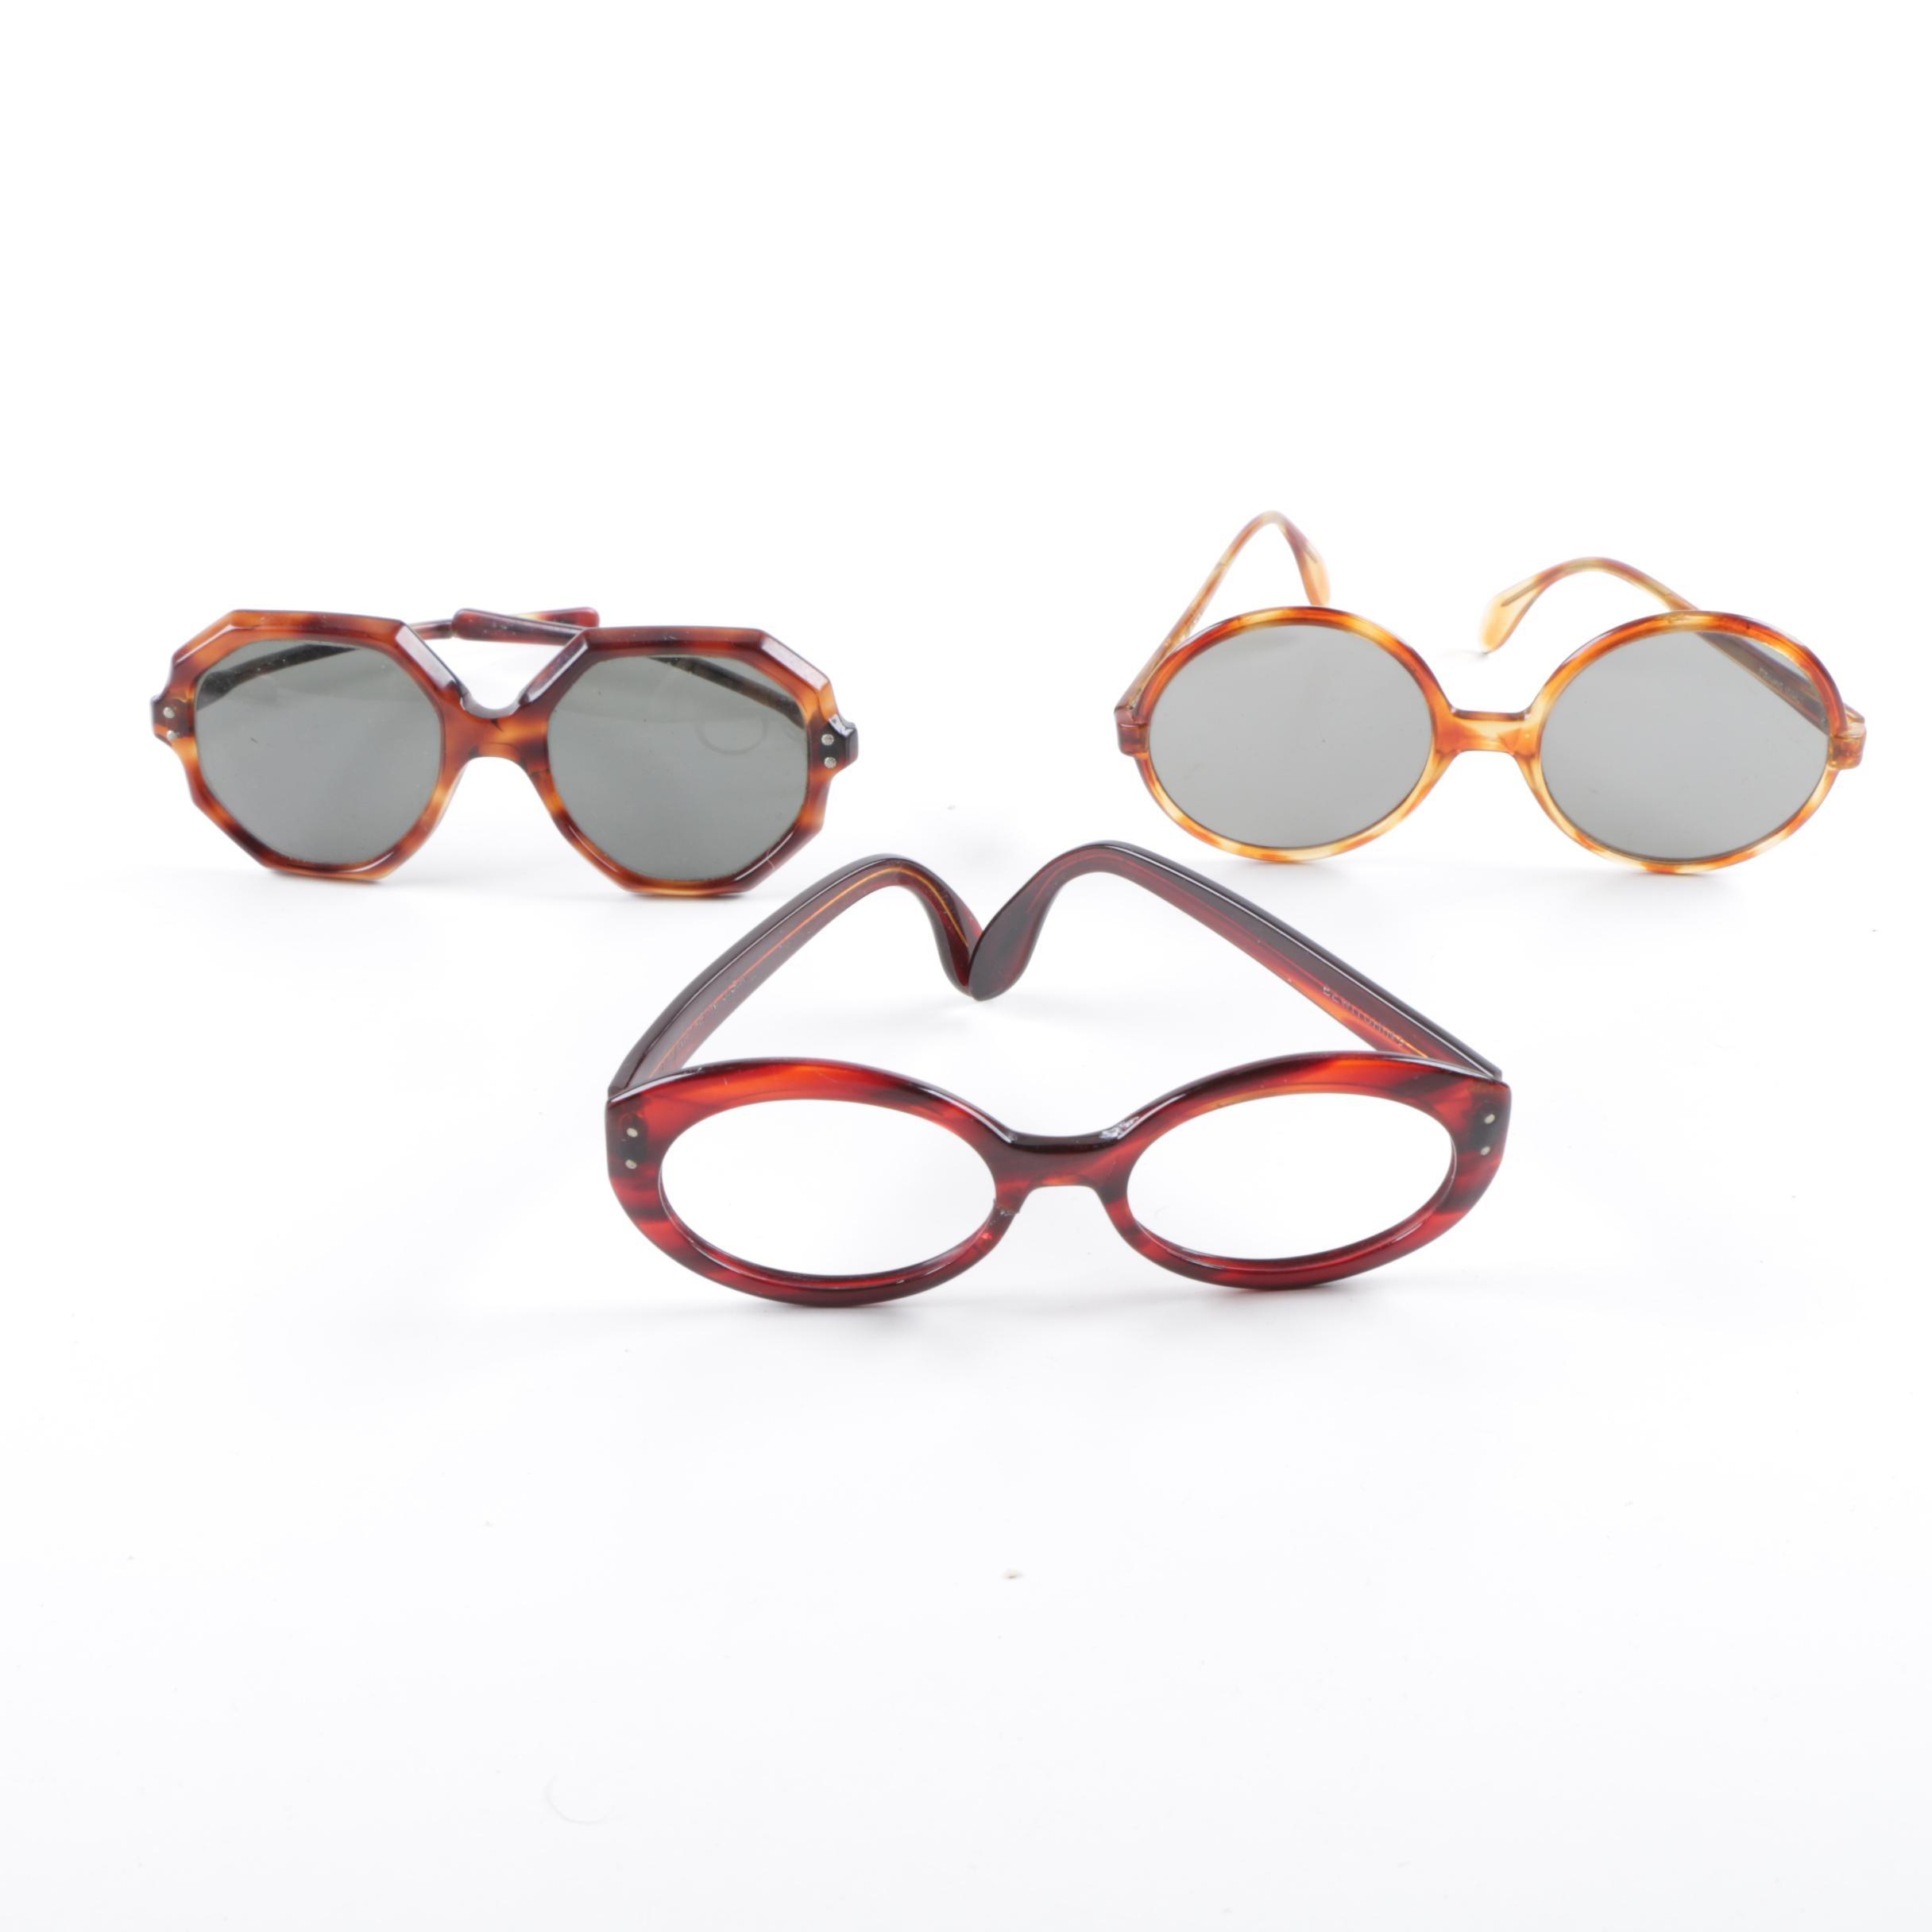 Vintage Sunglasses and Ray-Ban Frames